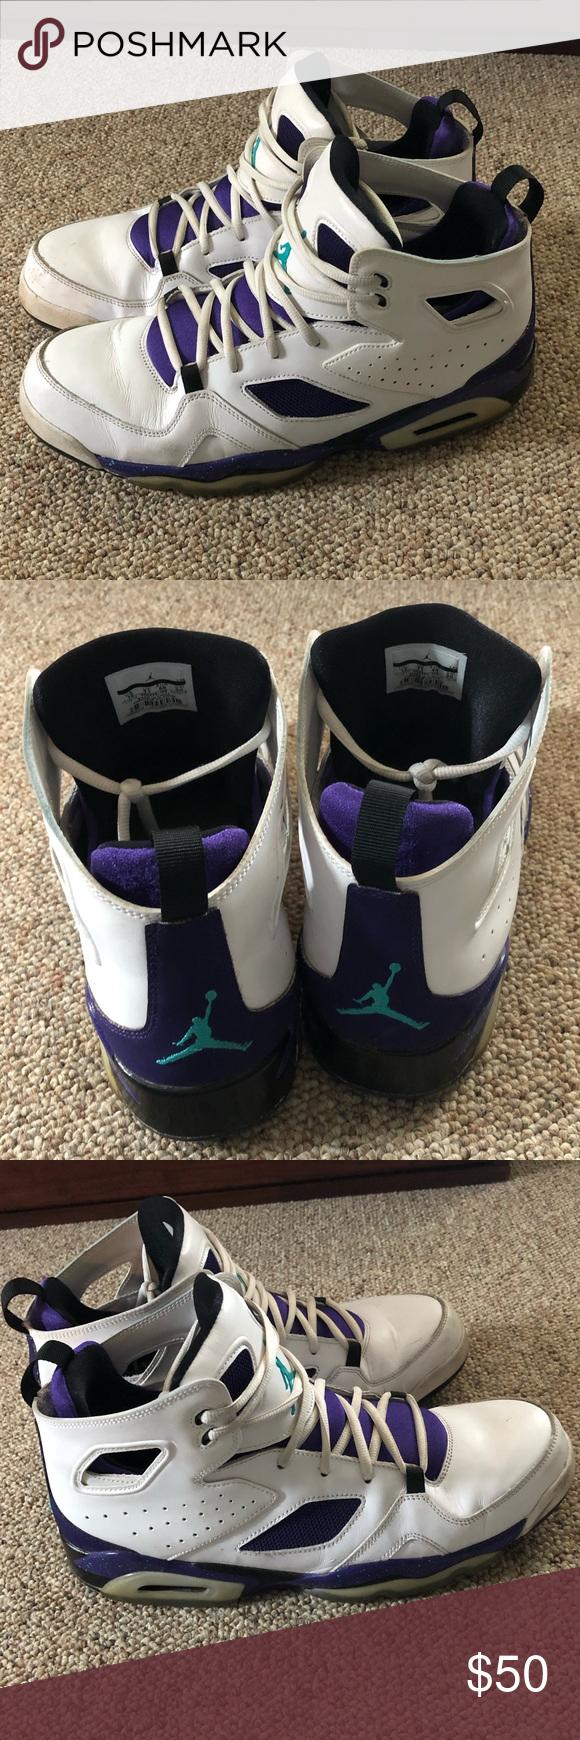 58d78d0a0d1c Jordan Flight Club  91 Grape Emerald shoe Really cool colorway of grape and  emerald on